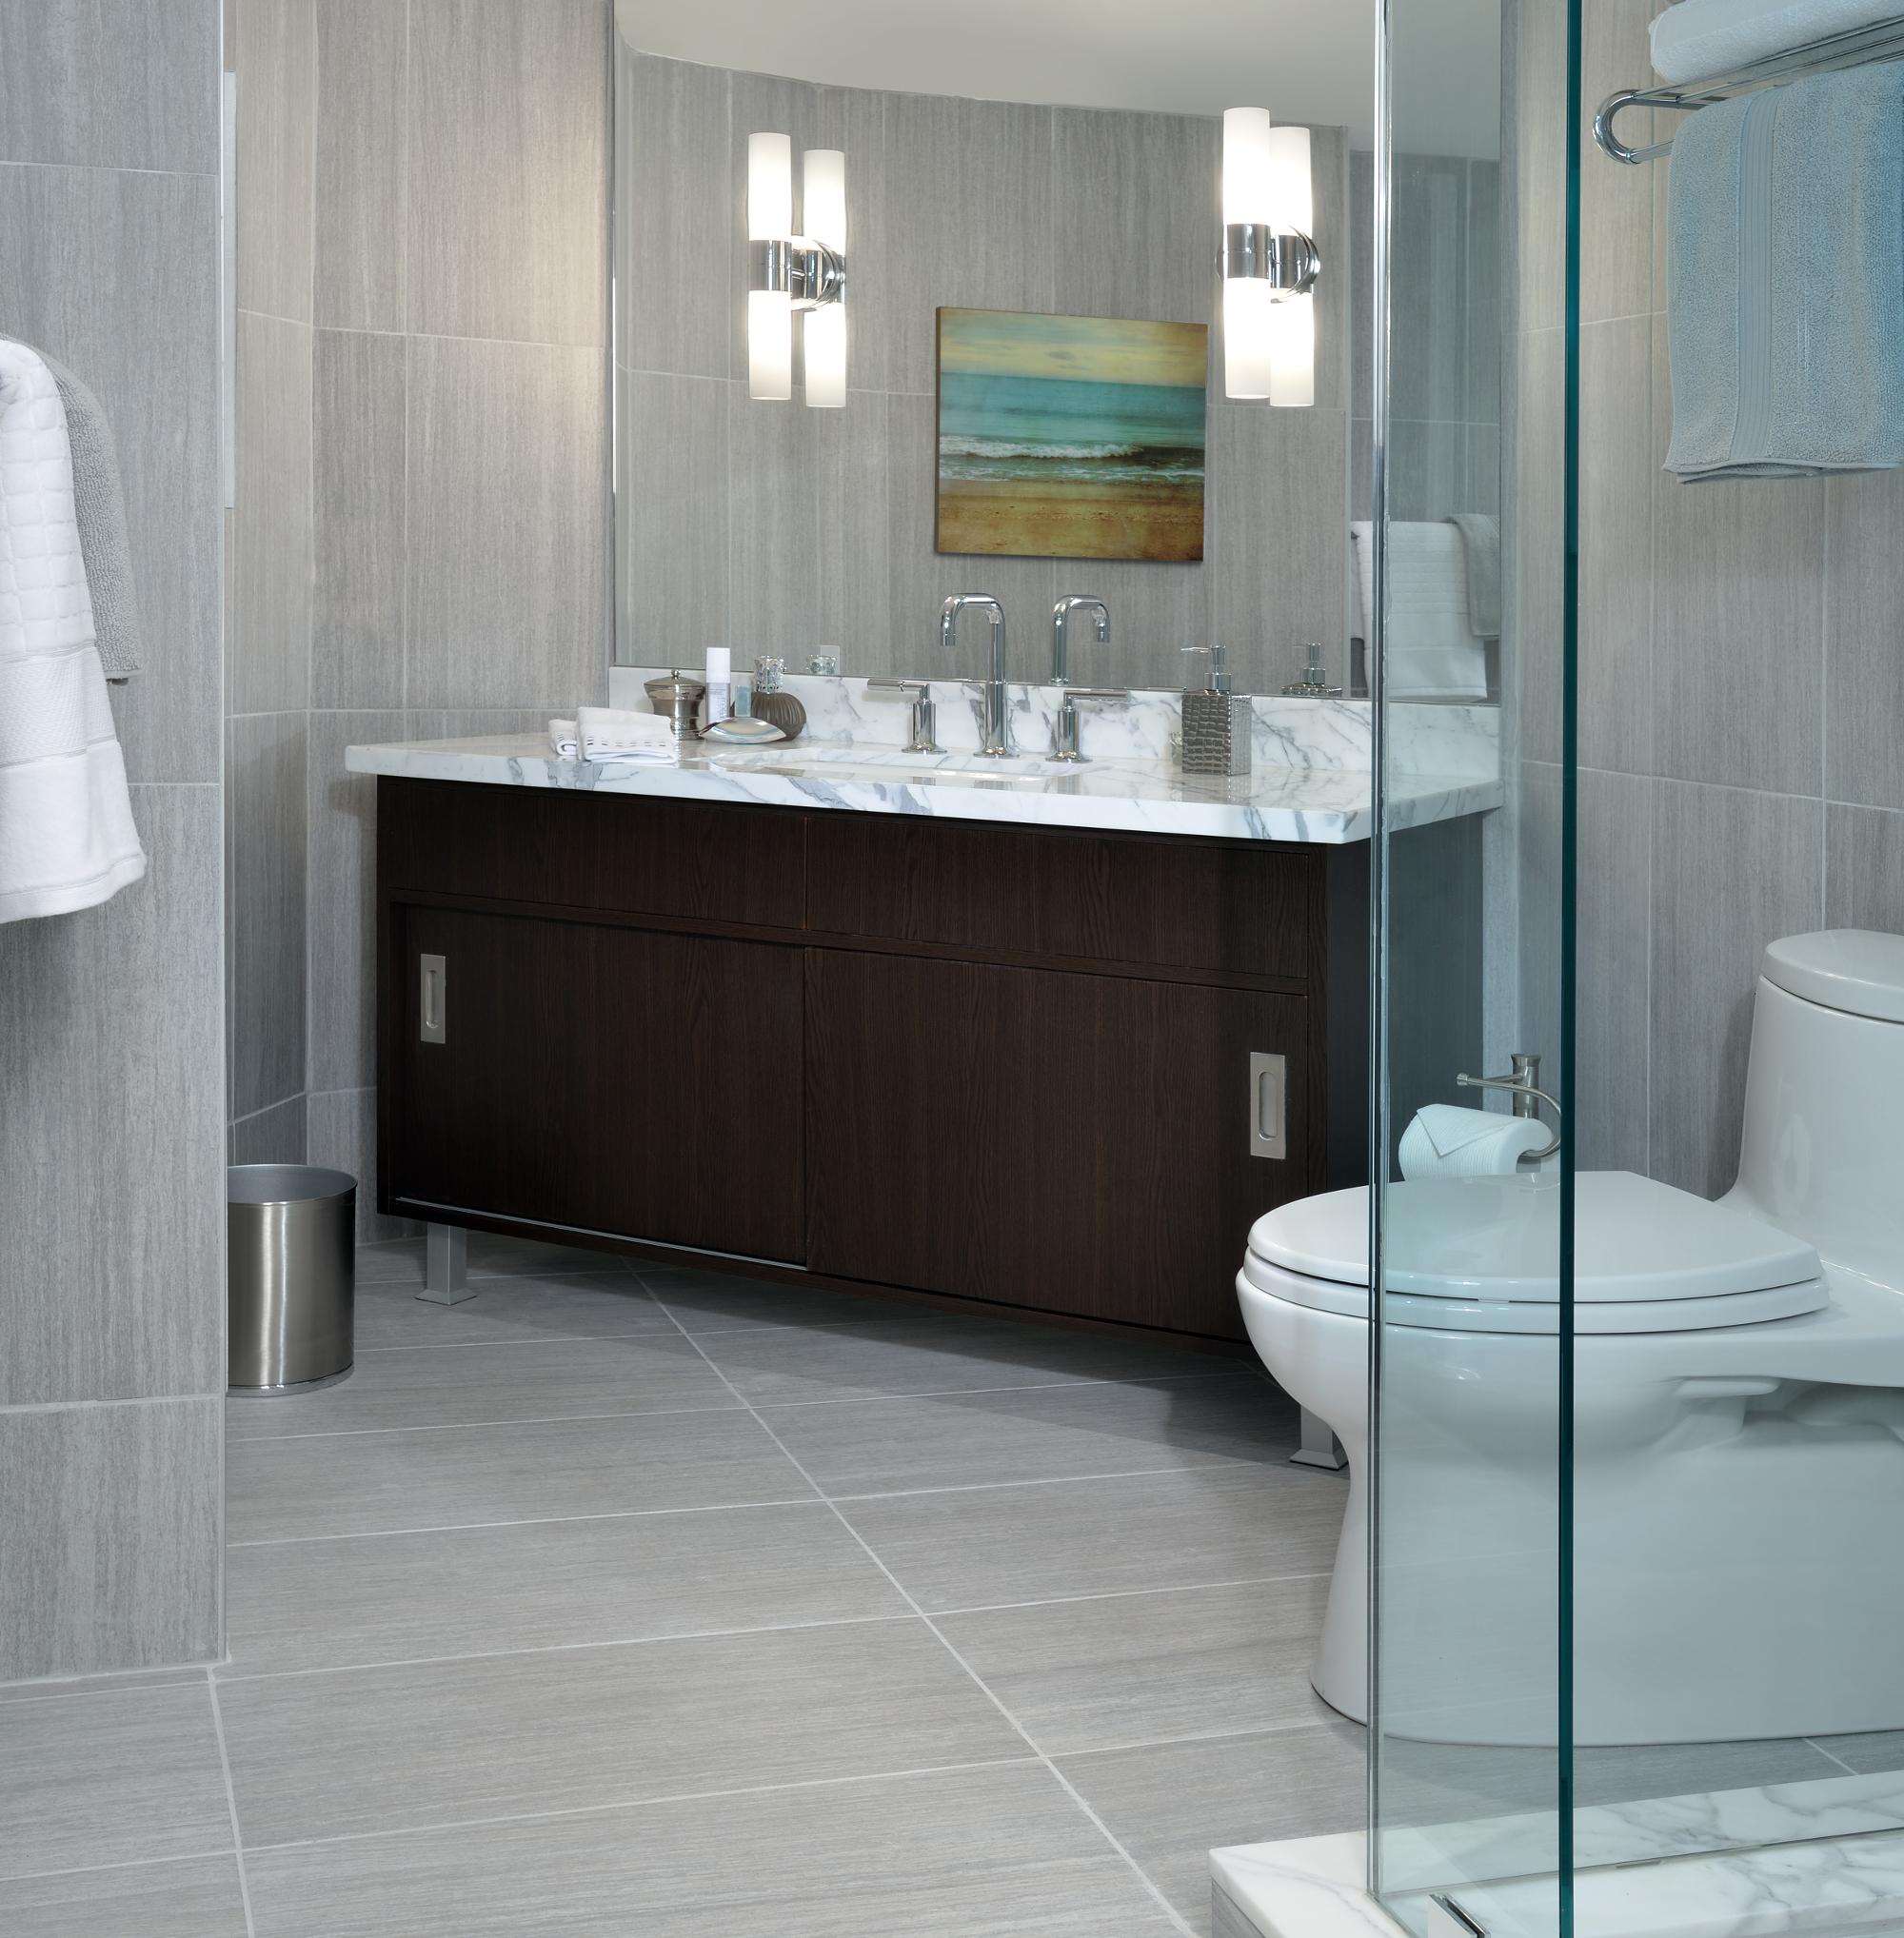 Bathroom Renovation Budget Breakdown  Home Trends Magazine